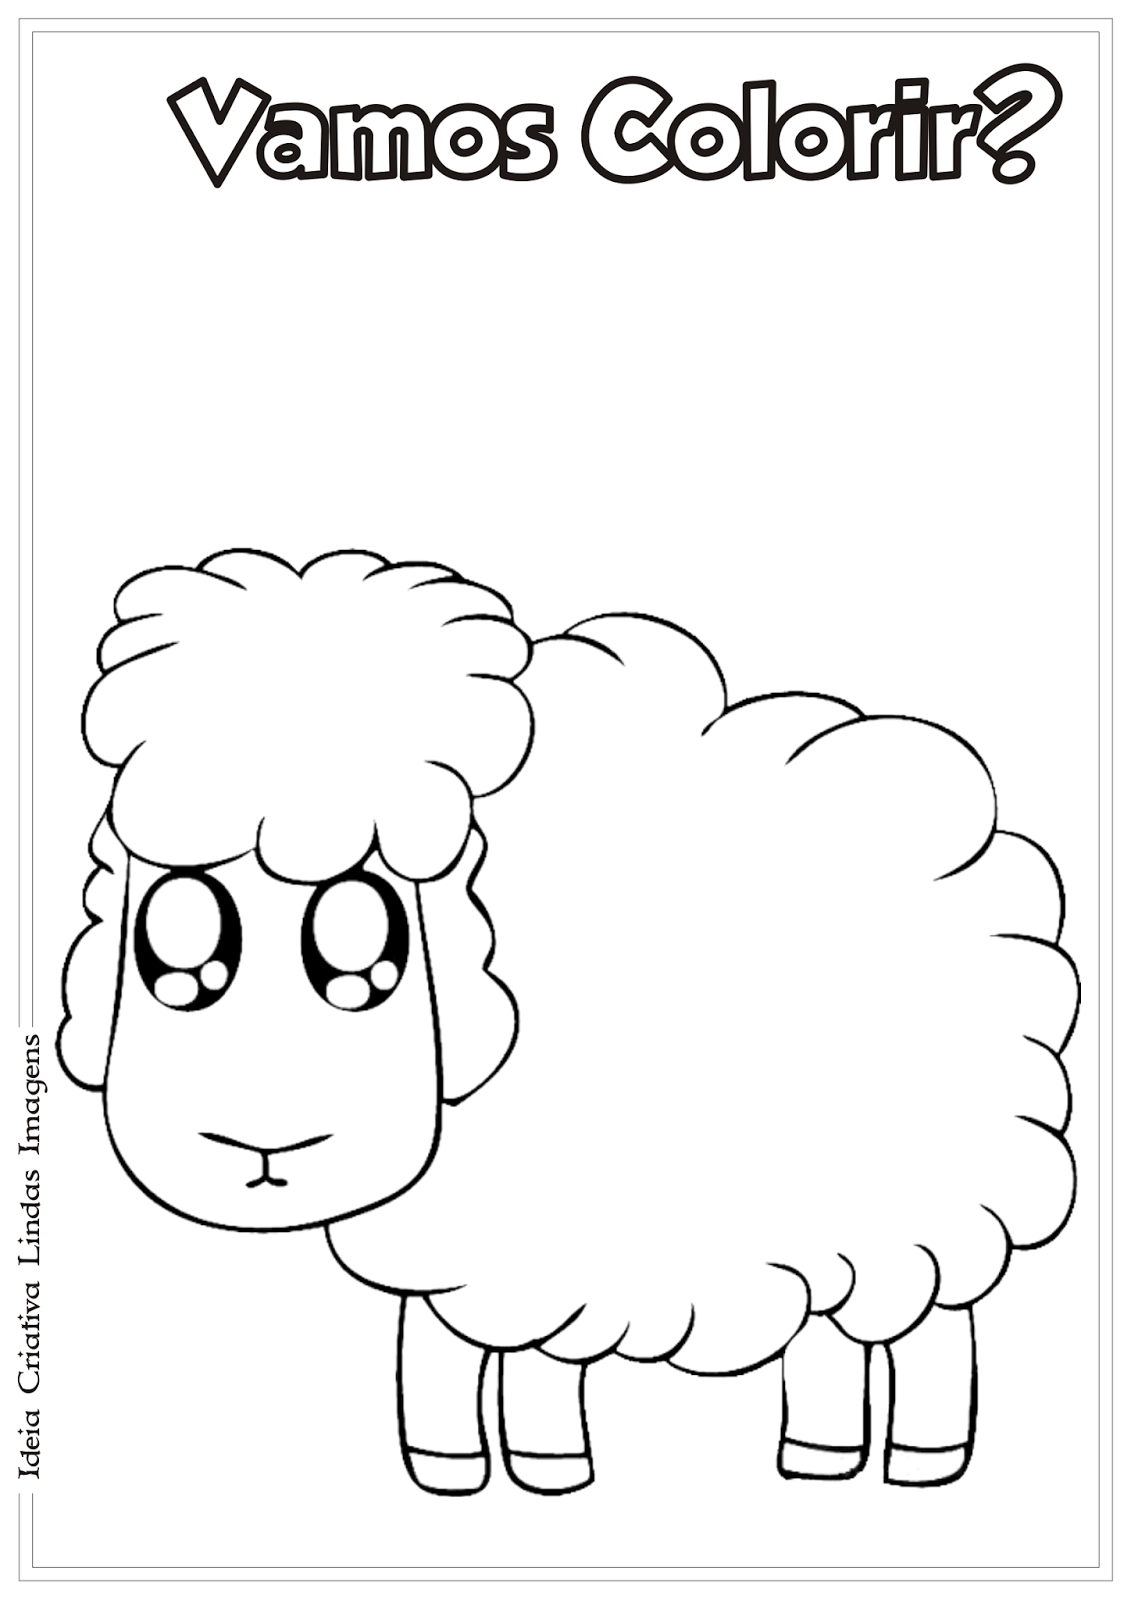 Páscoa Cristã desenho para colorir